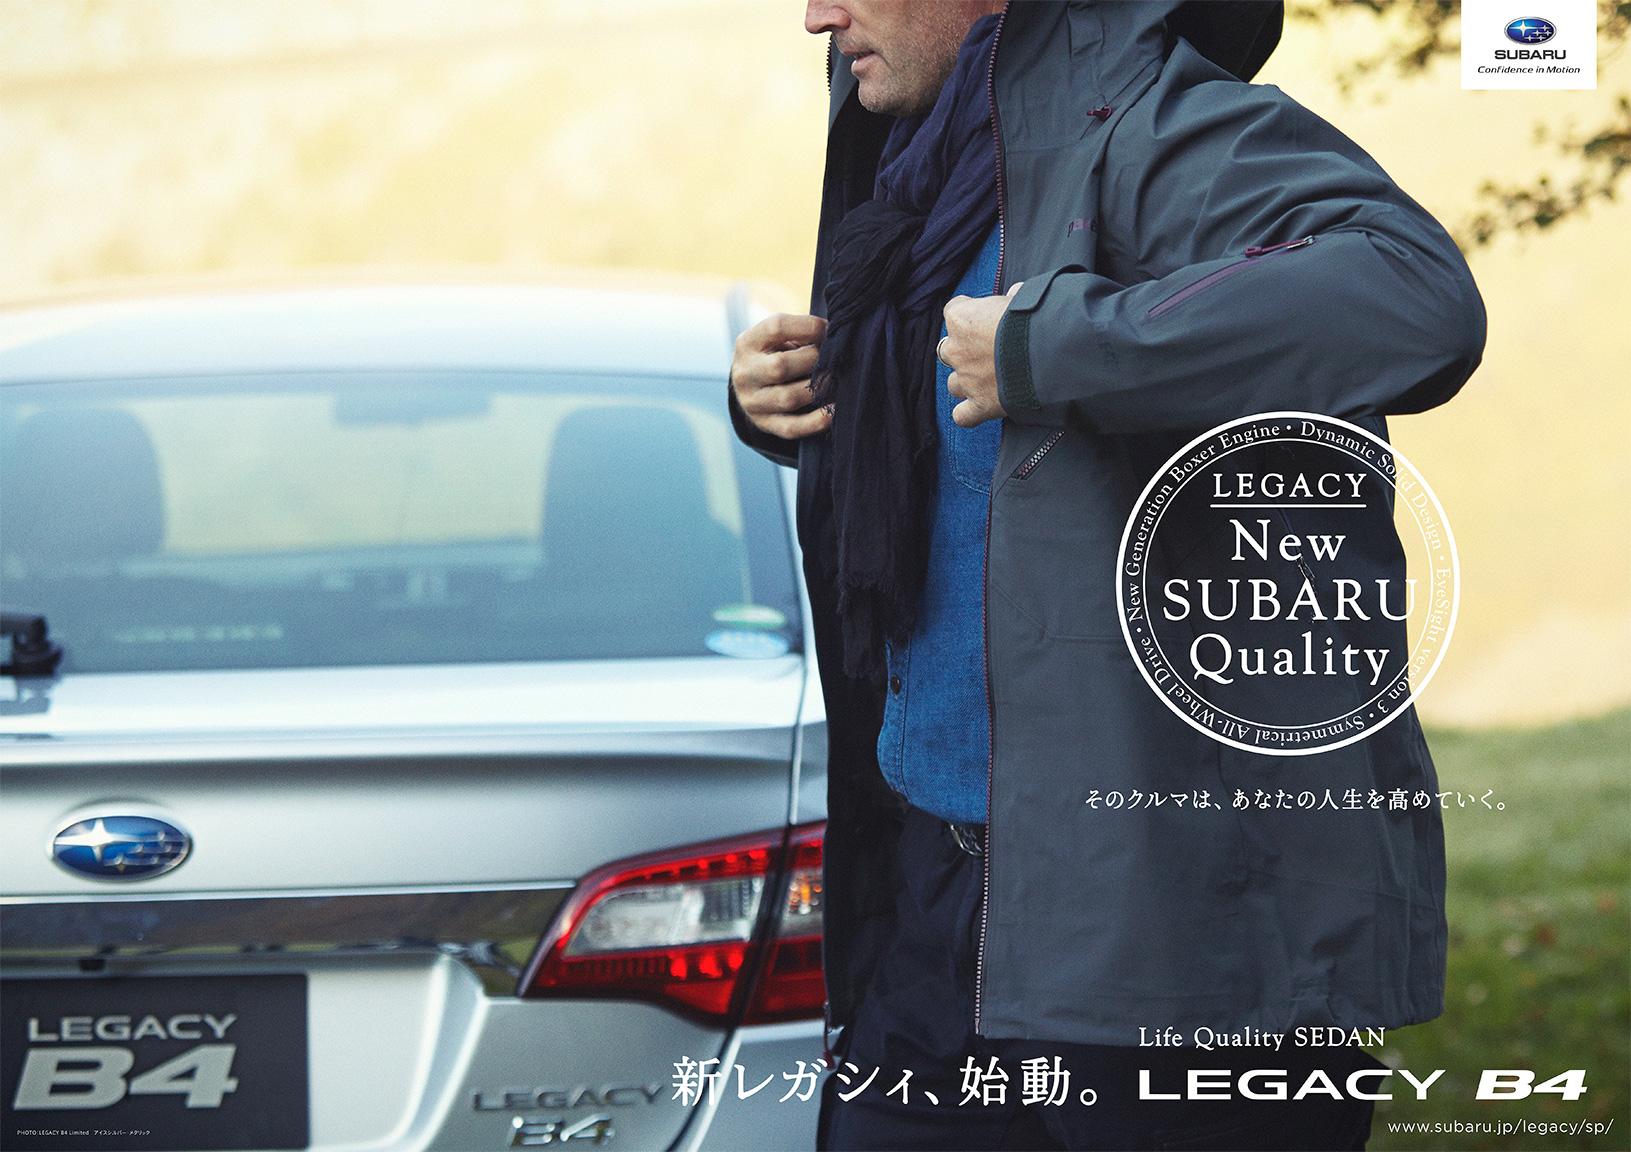 Subaru Outback Legacy New quality, Oregon, Norway, Australia, Portland, kayak, advertising, campaign